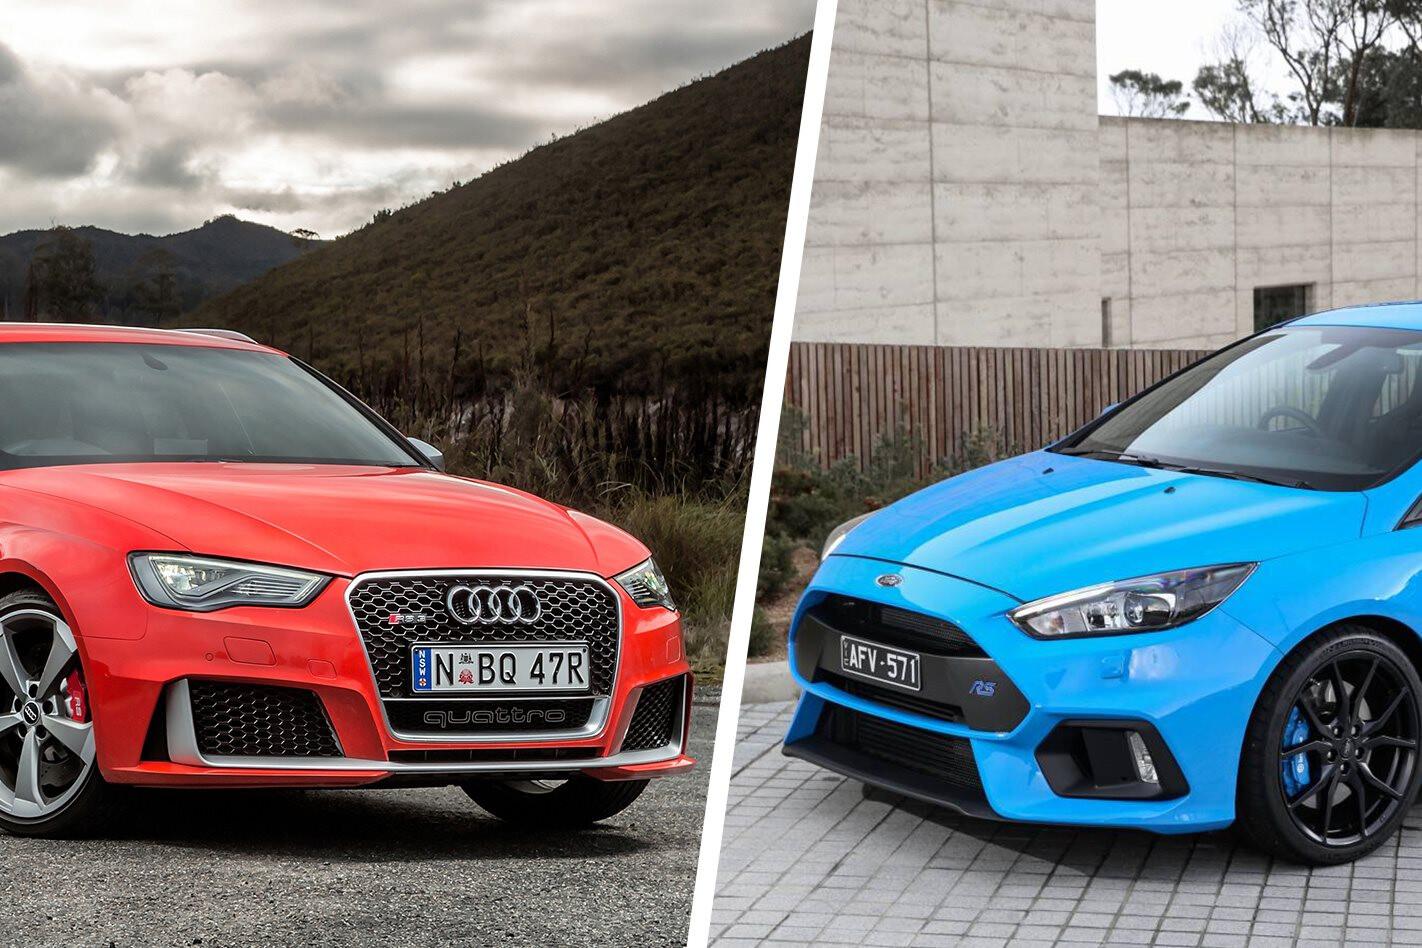 2016 Audi RS3 Sportback vs Ford Focus RS